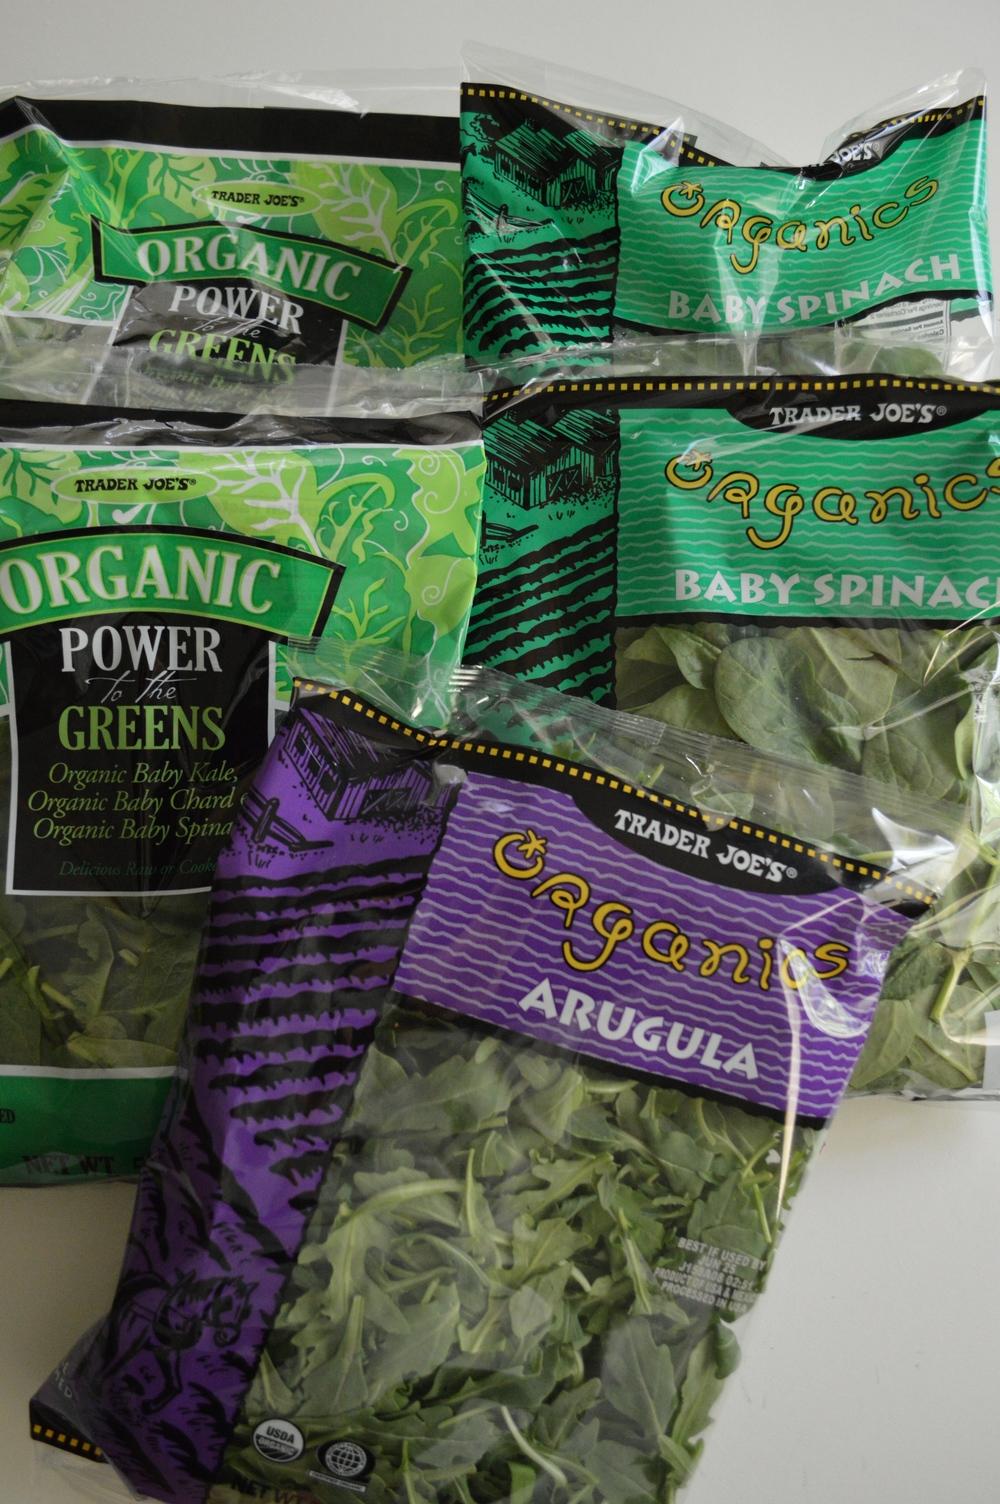 LeafyGreensLaurenSchwaiger.com.jpg